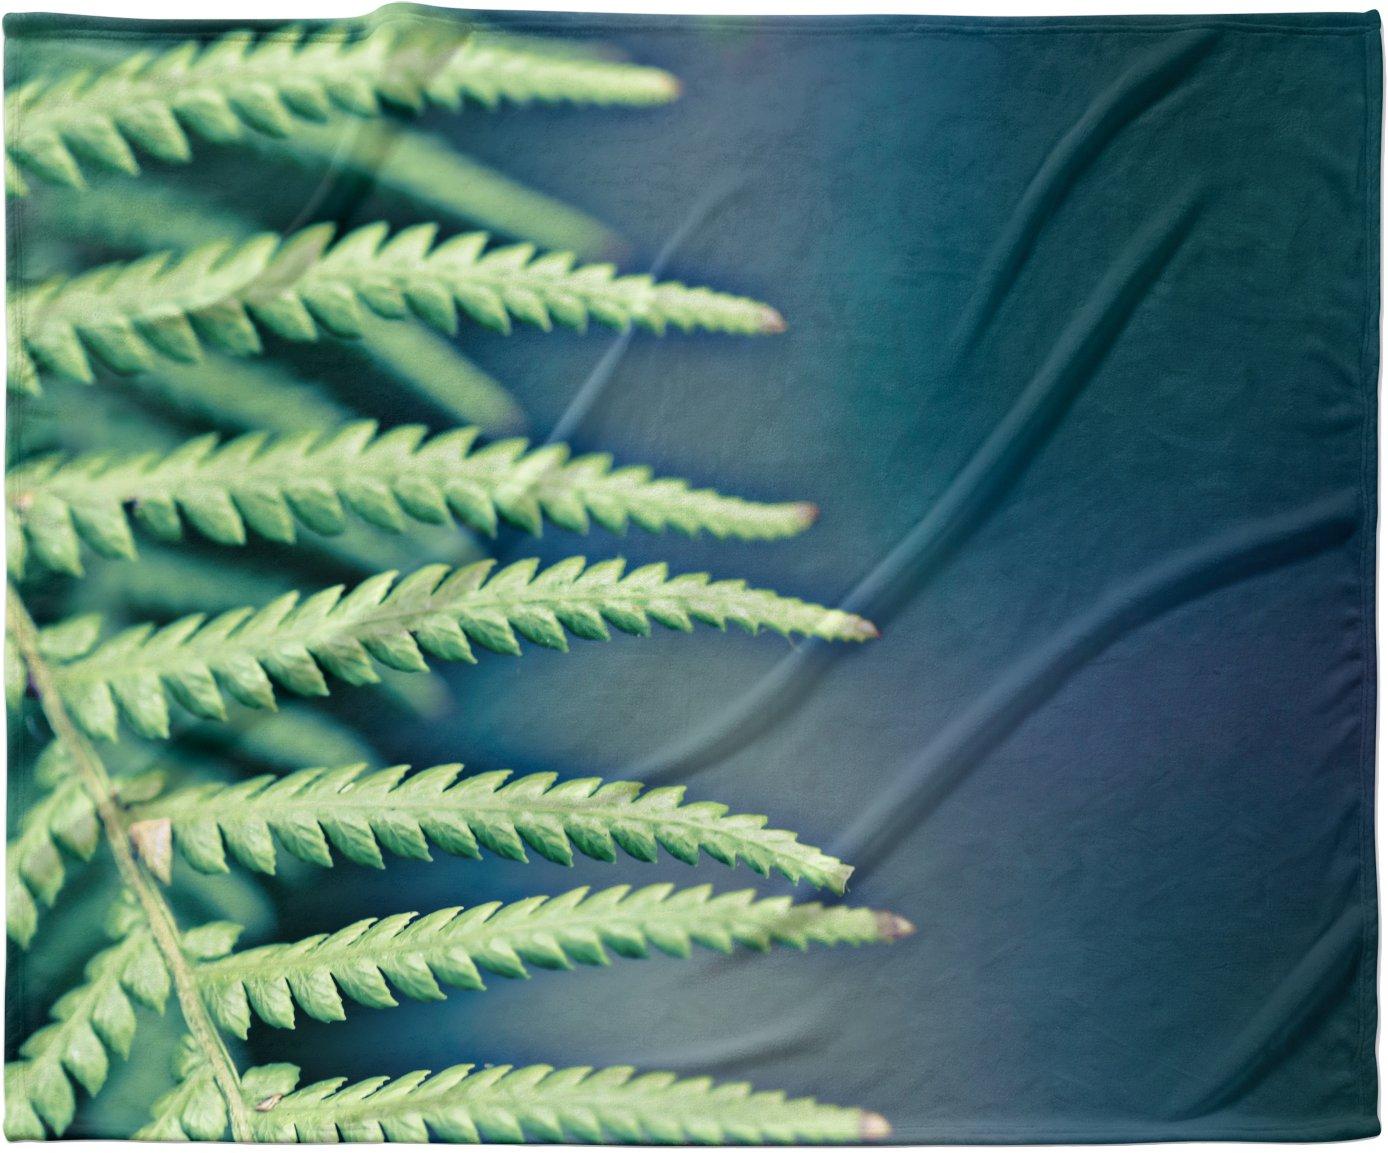 KESS InHouse Ann Barnes Into the Forest Blue Green Fleece Baby Blanket 40 x 30